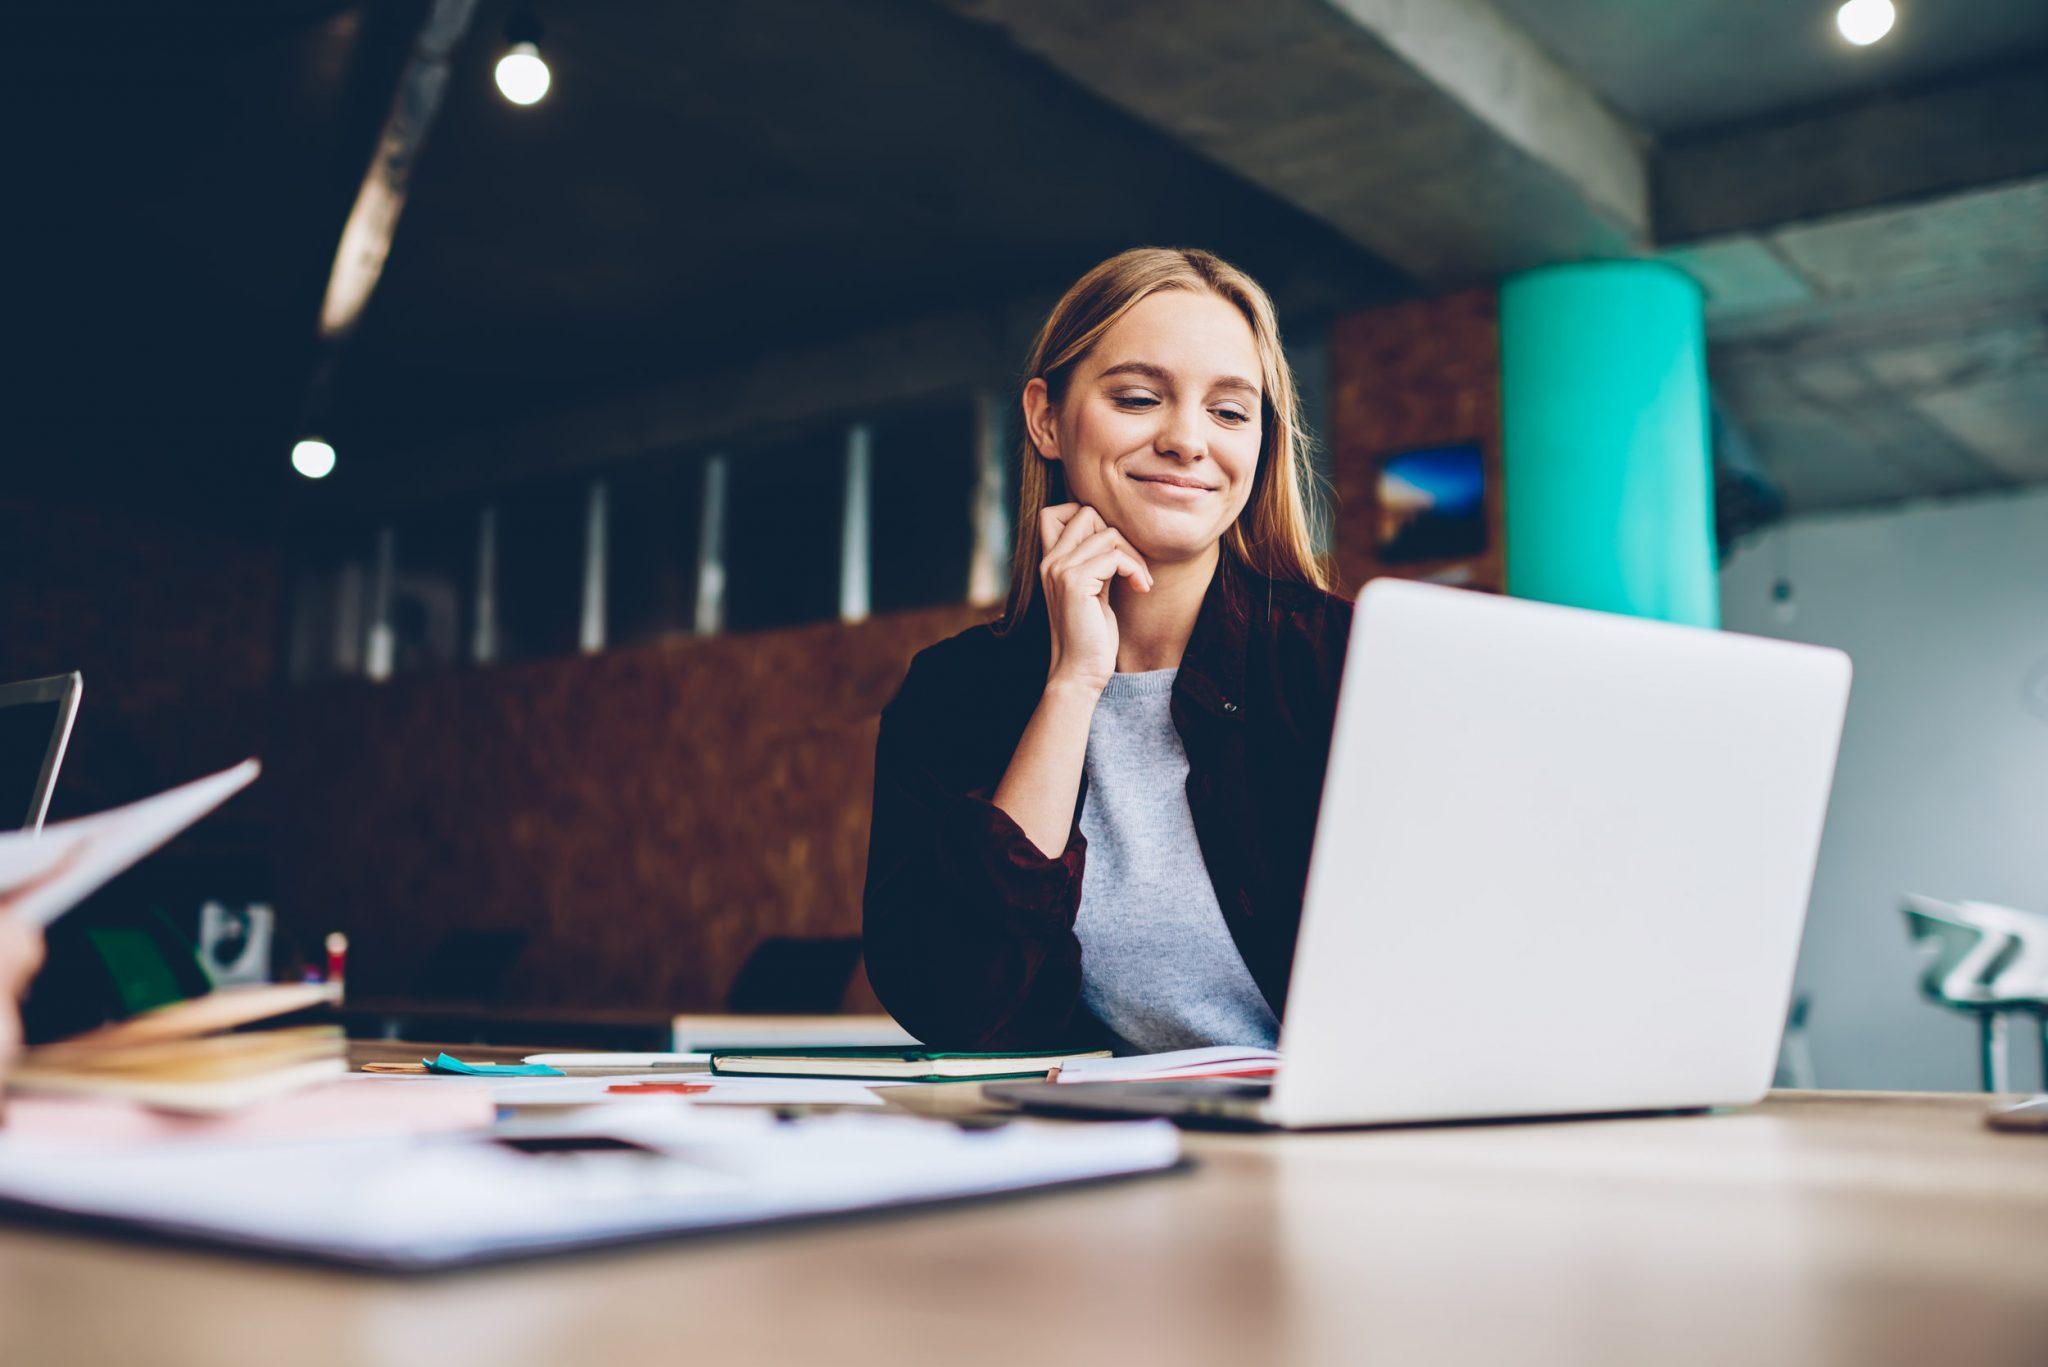 7 career advice blogs you need to follow ASAP image